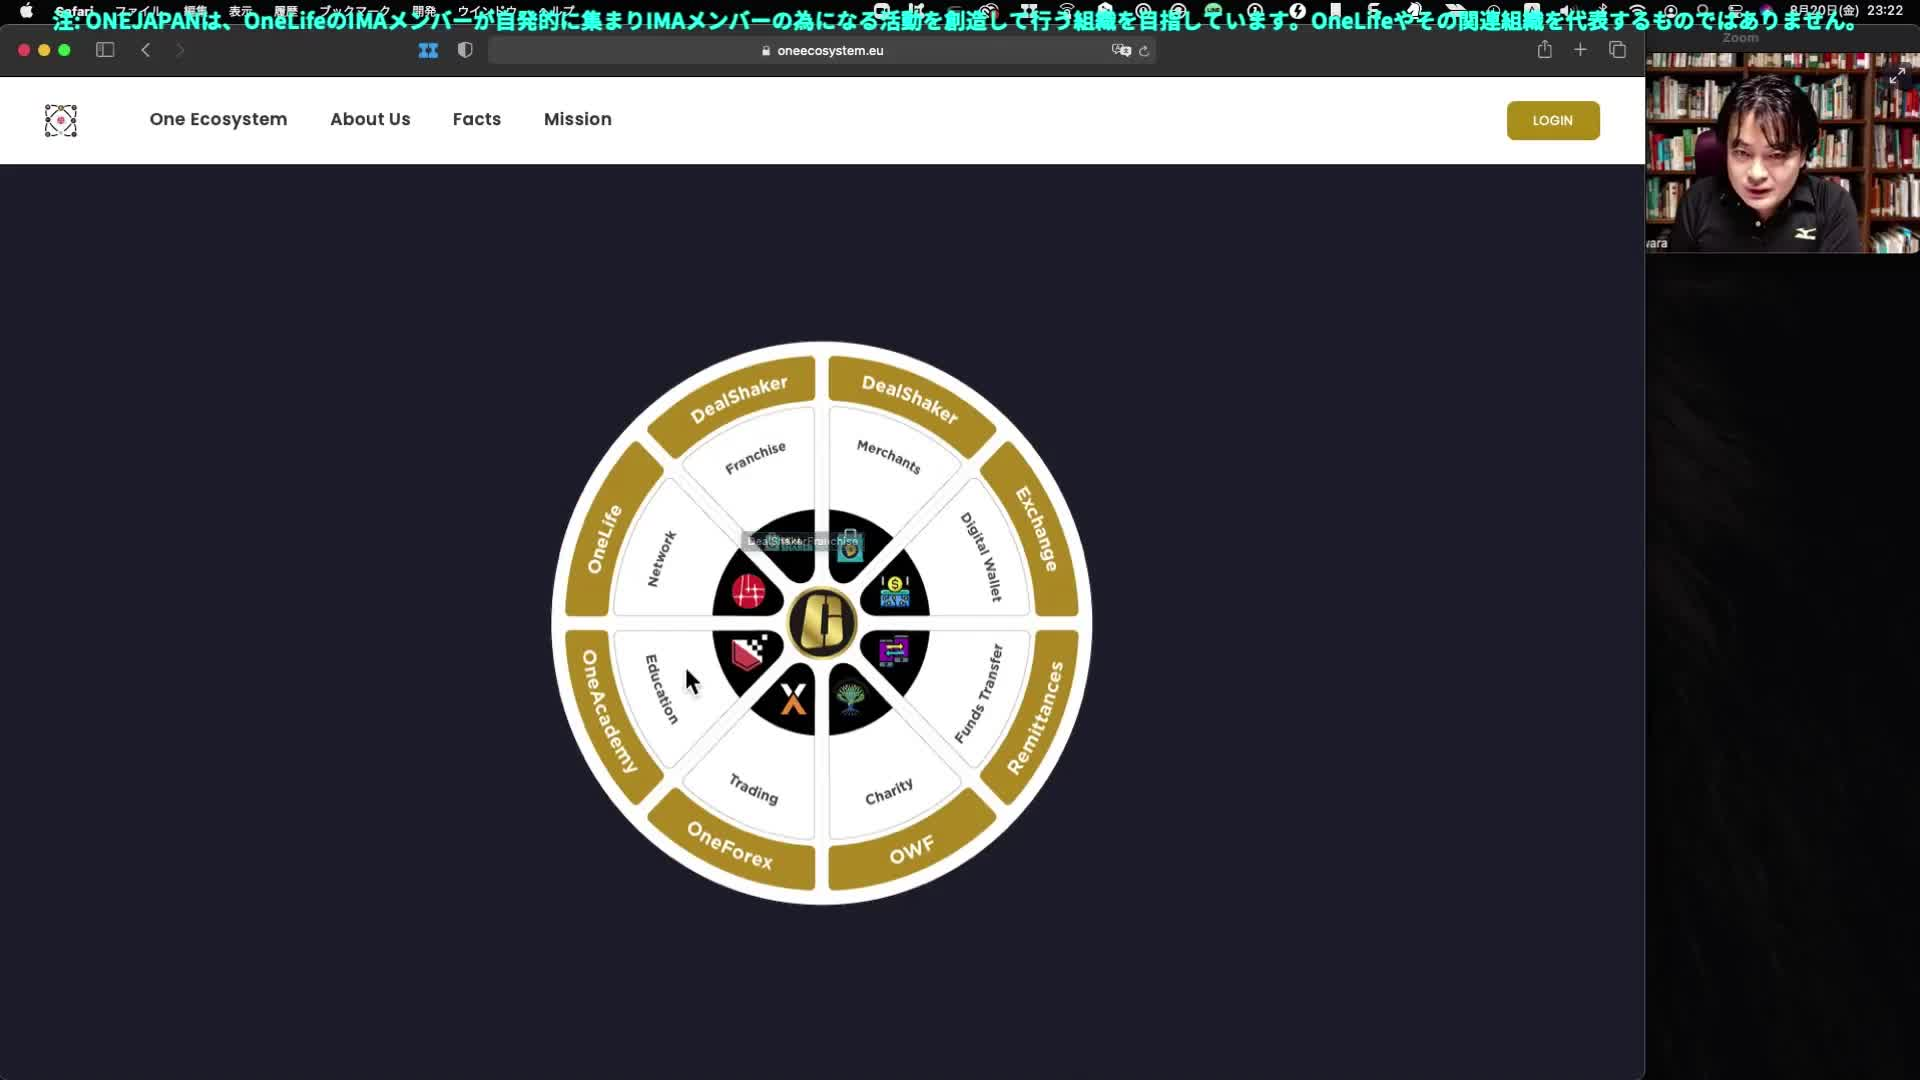 ONEJAPAN週間報告会(前半)2021年8月21日、10:15